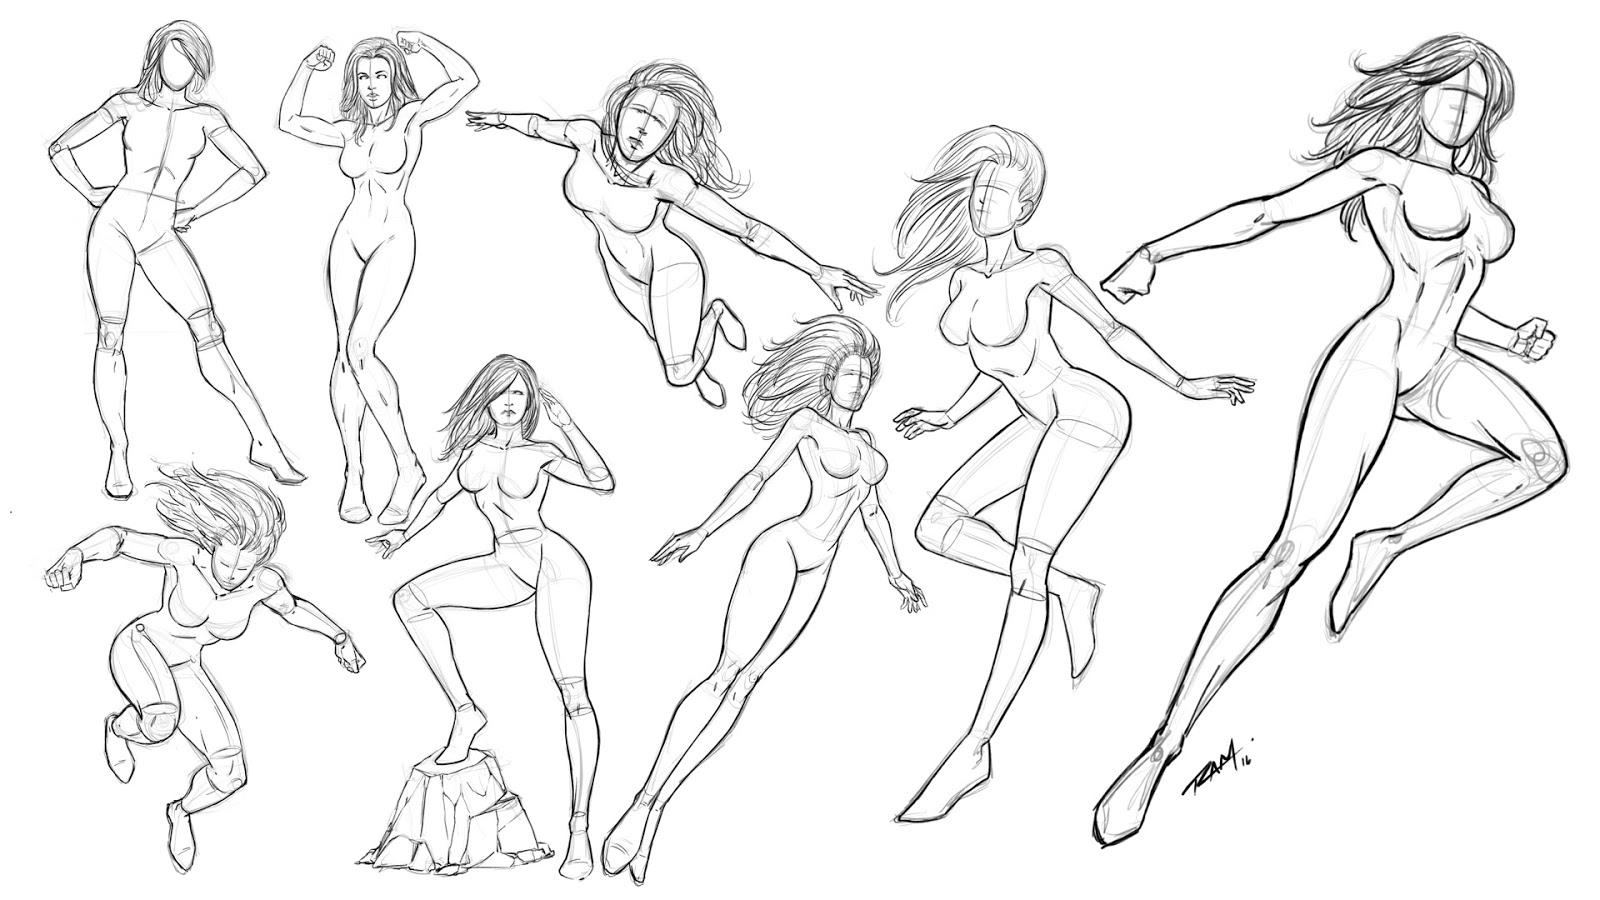 Ram Studios Comics Drawing Superhero Women Various Poses Comic Style